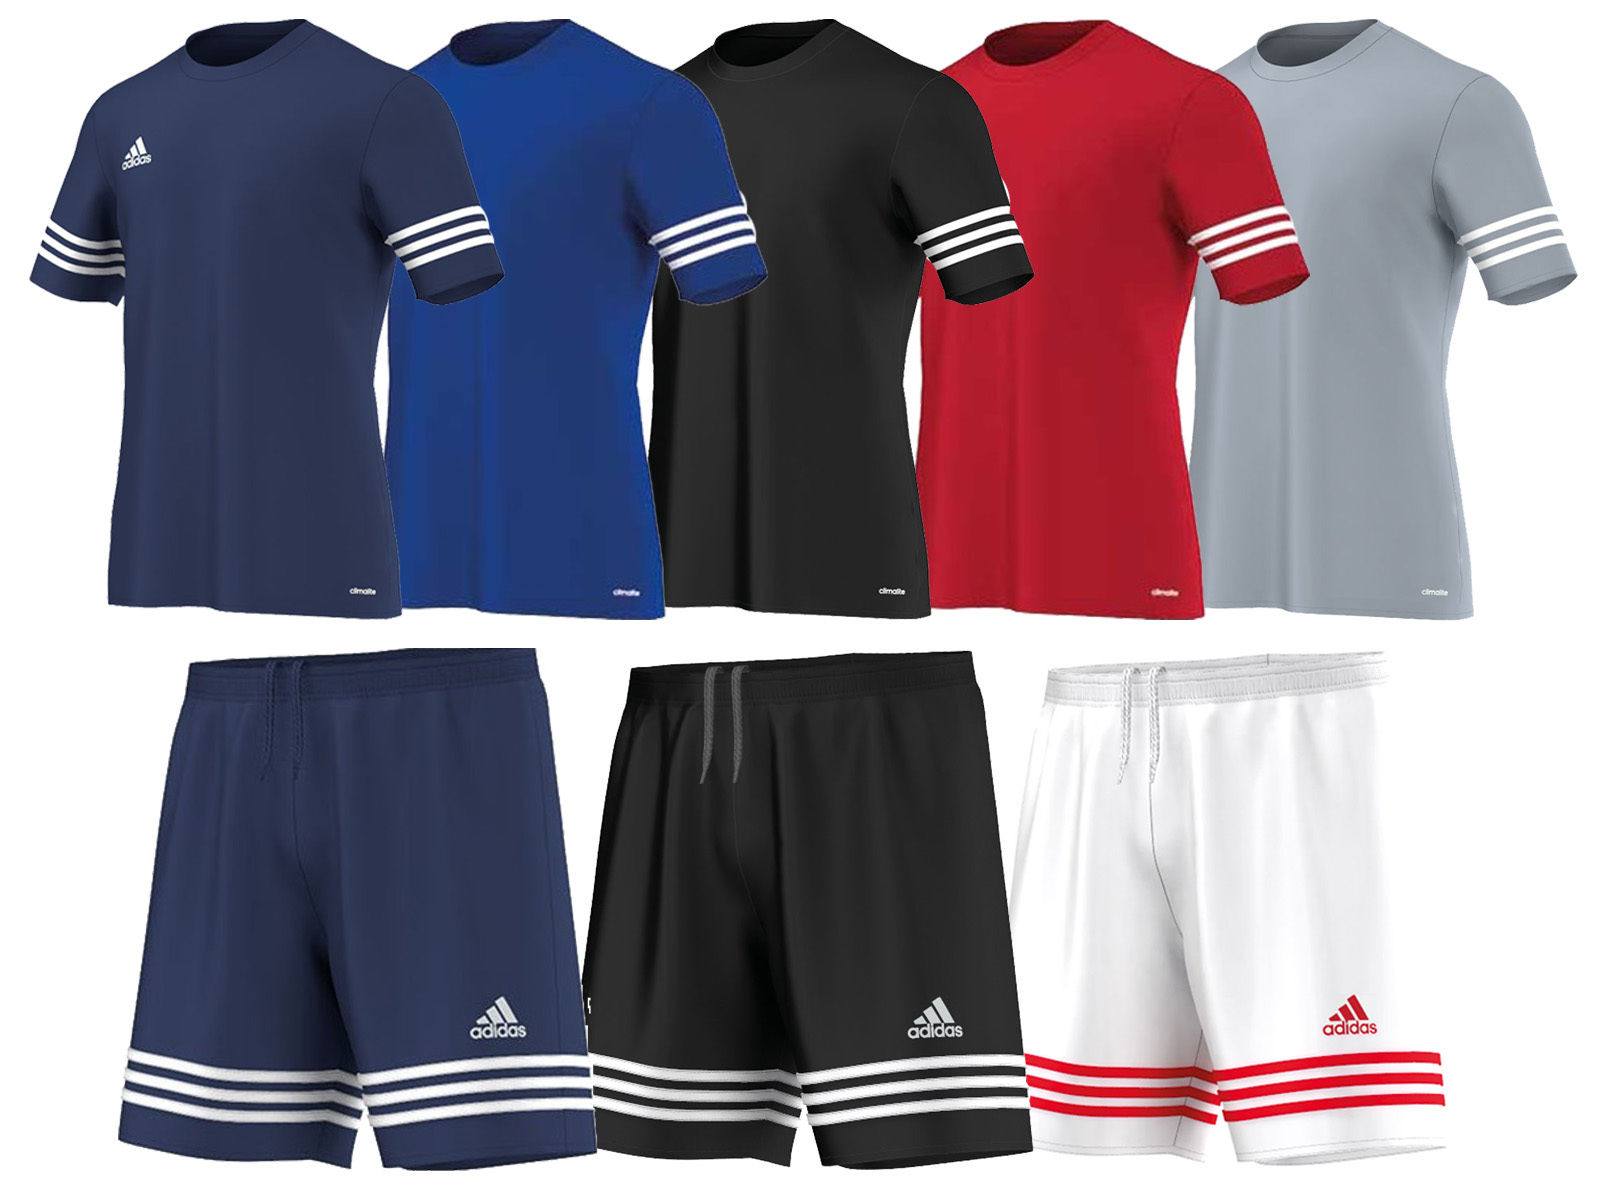 New Mens Adidas Entrada 14 Climalite T Shirt   Football Gym Training